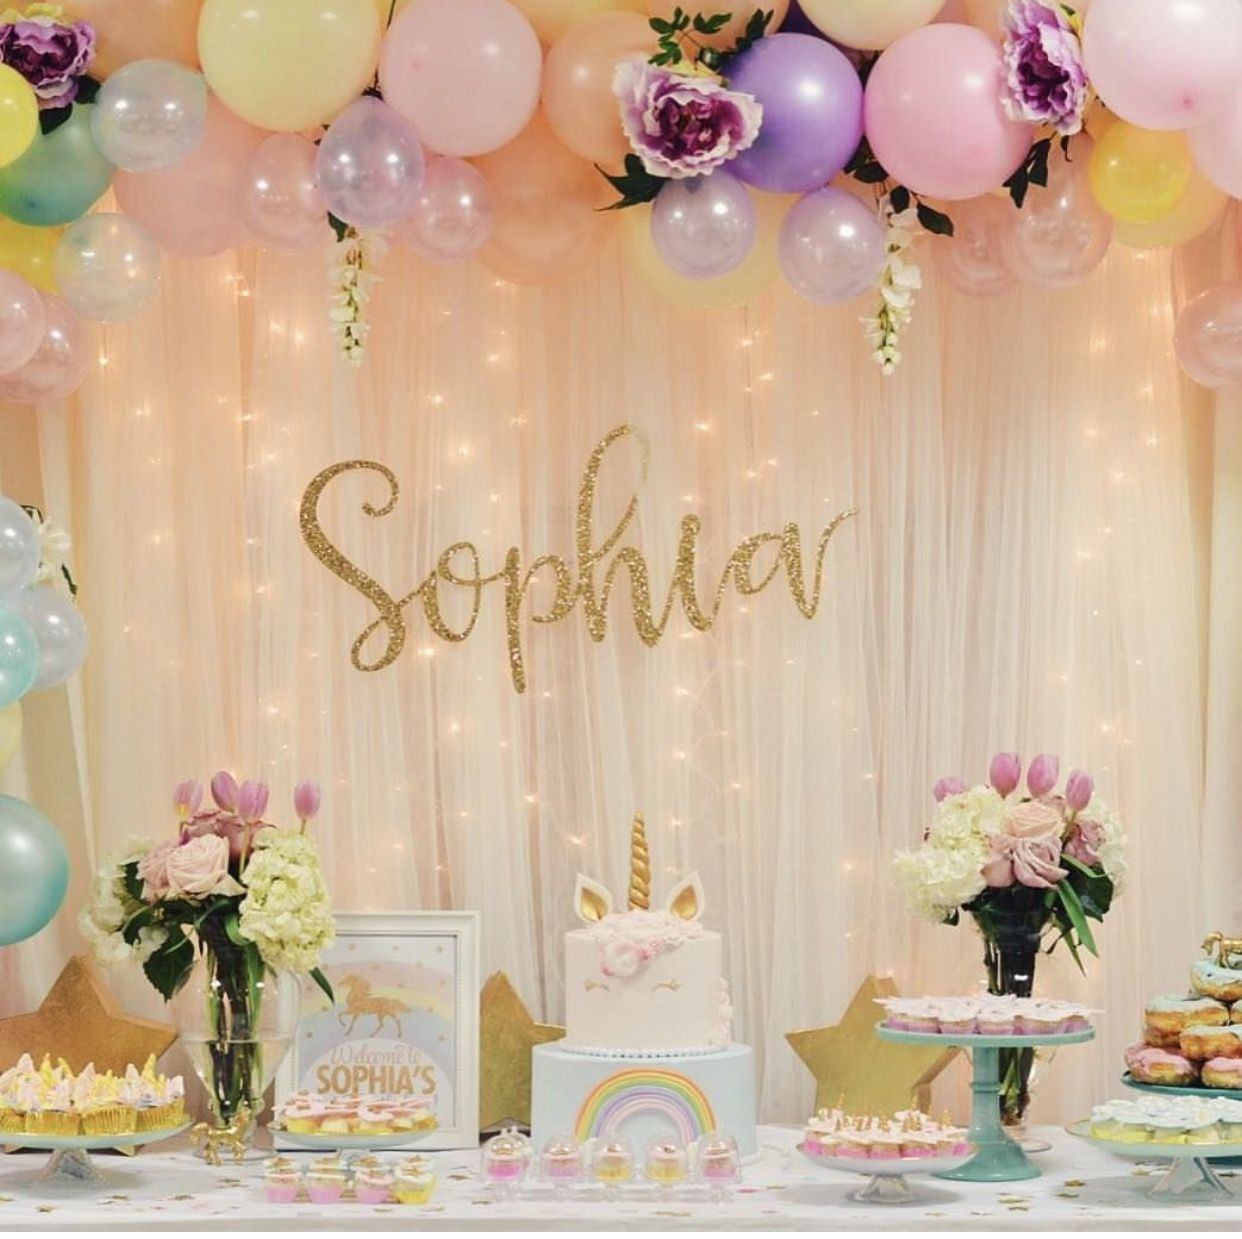 Pin de angela garcia en unicorn birthday party ideas for Cuarto adornado para cumpleanos